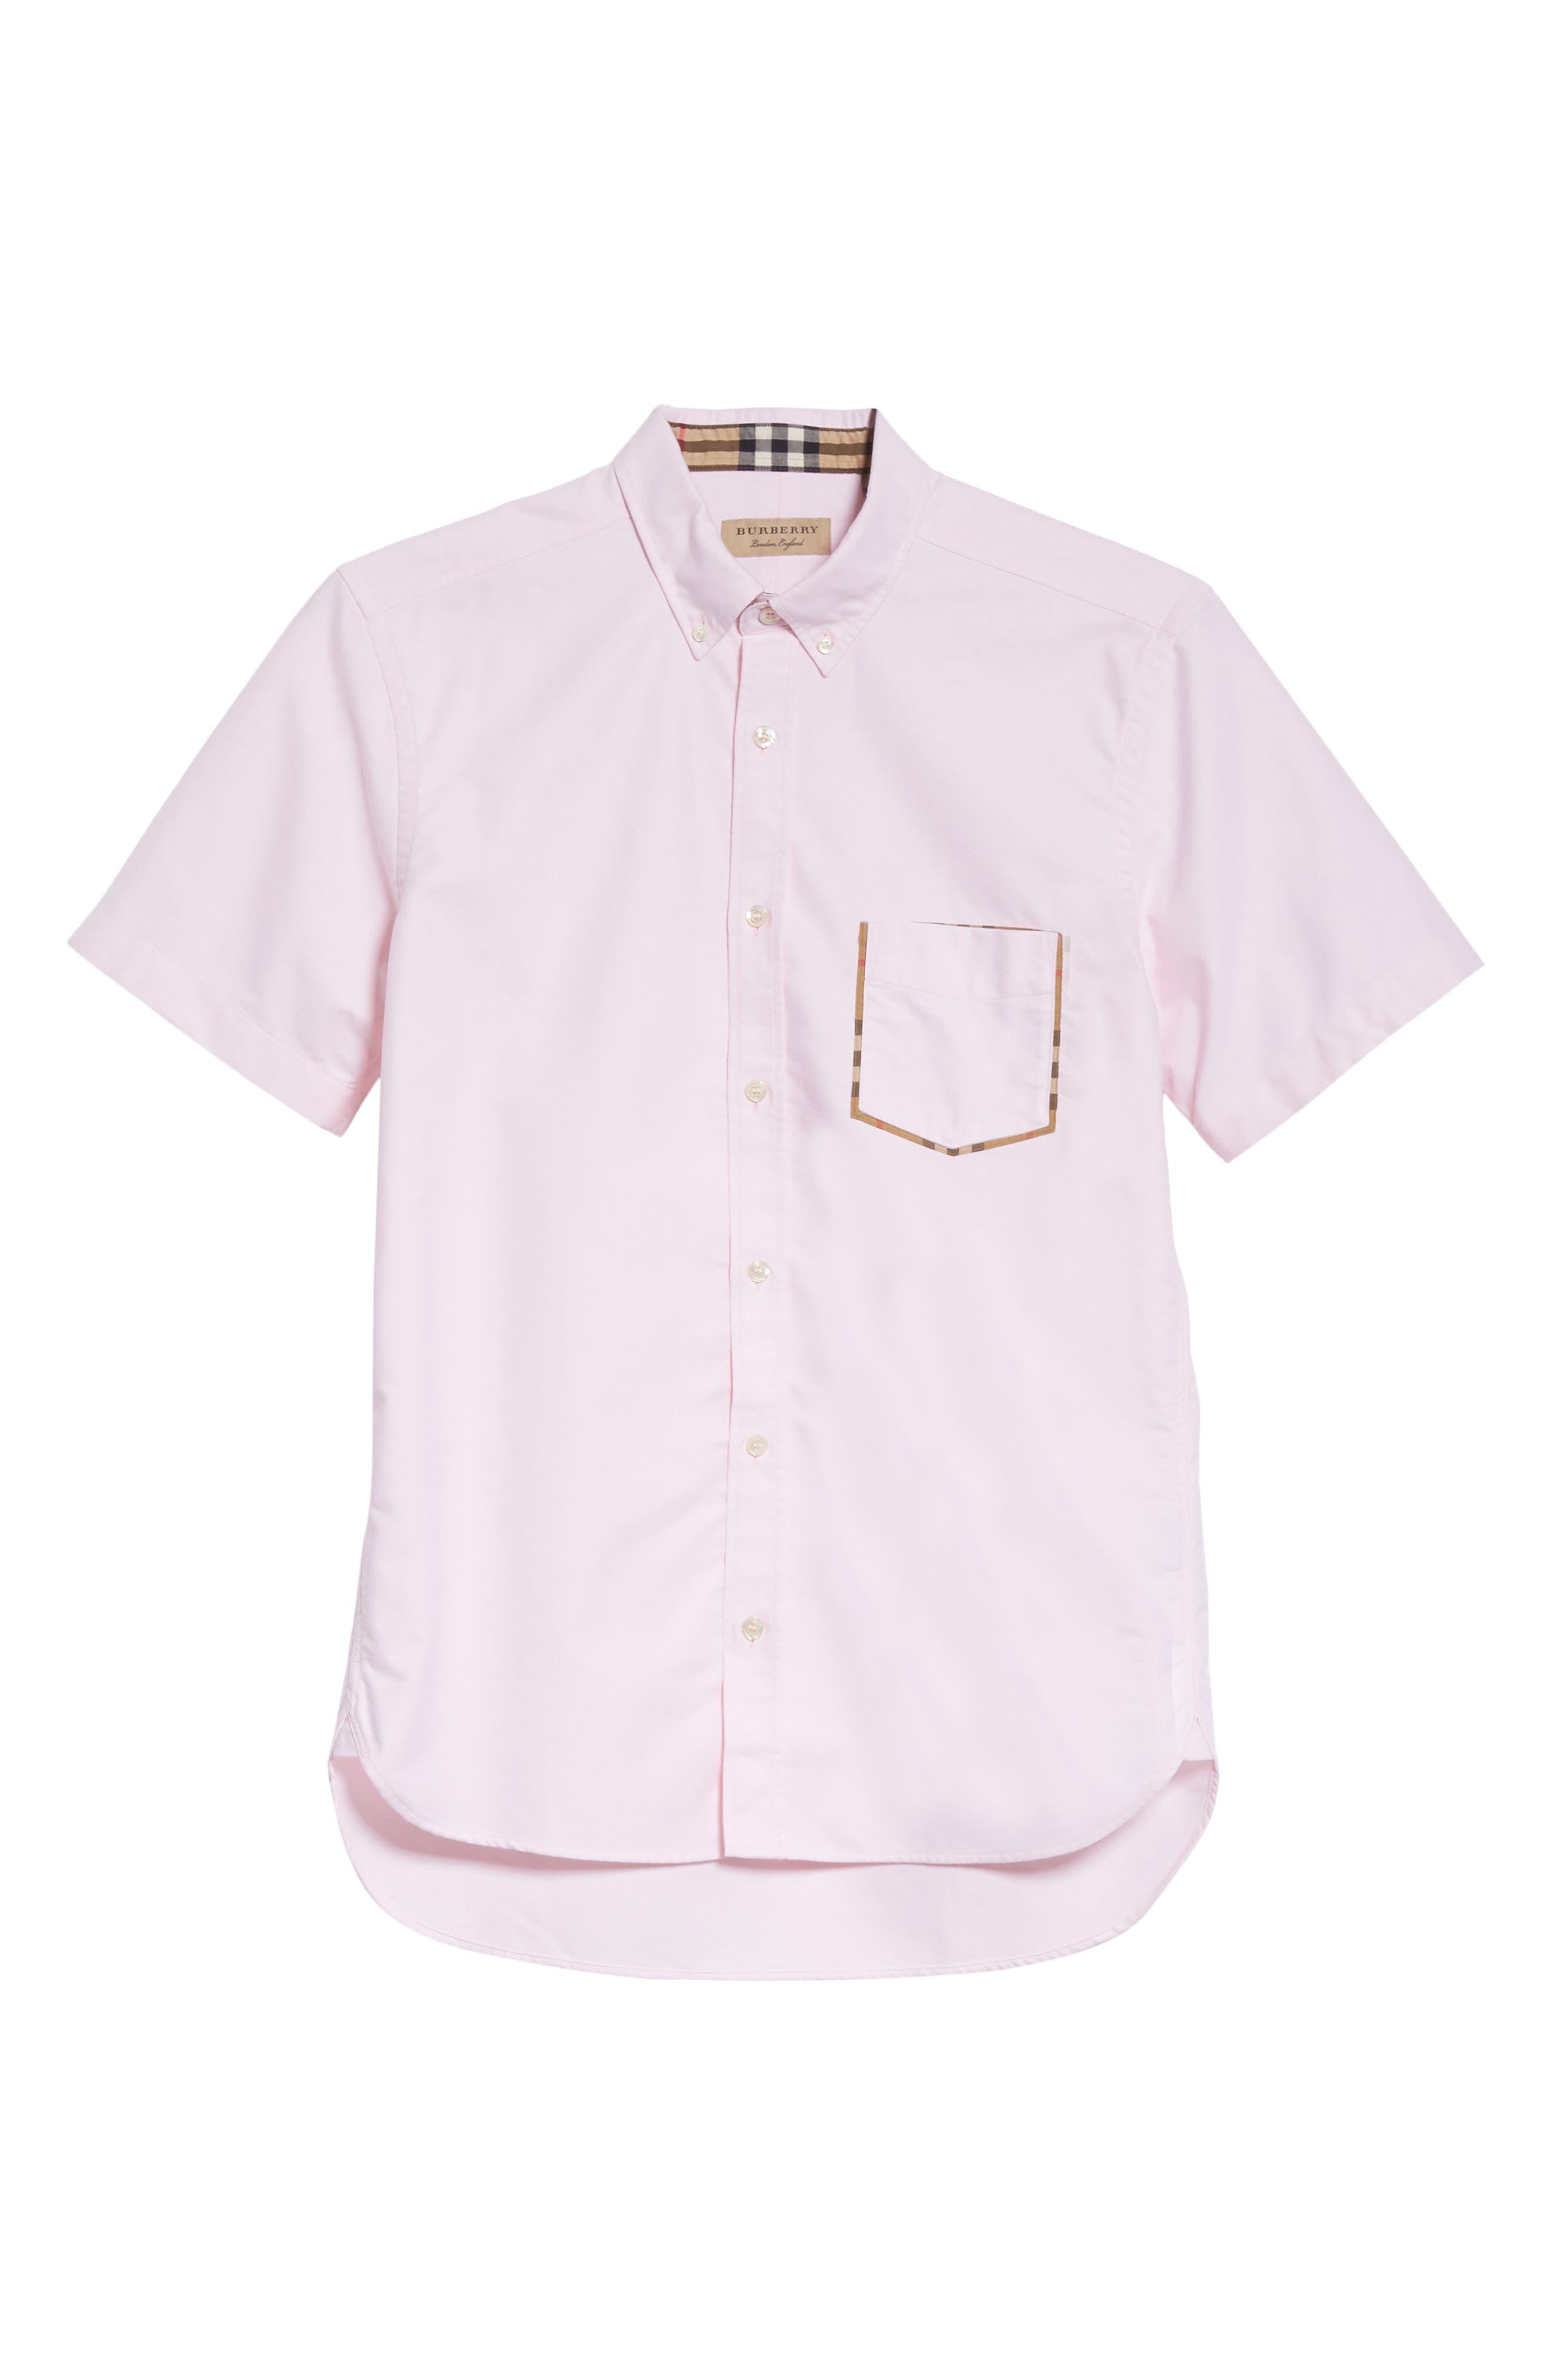 Harry Woven Sport Shirt,                             Alternate thumbnail 6, color,                             PALE PINK